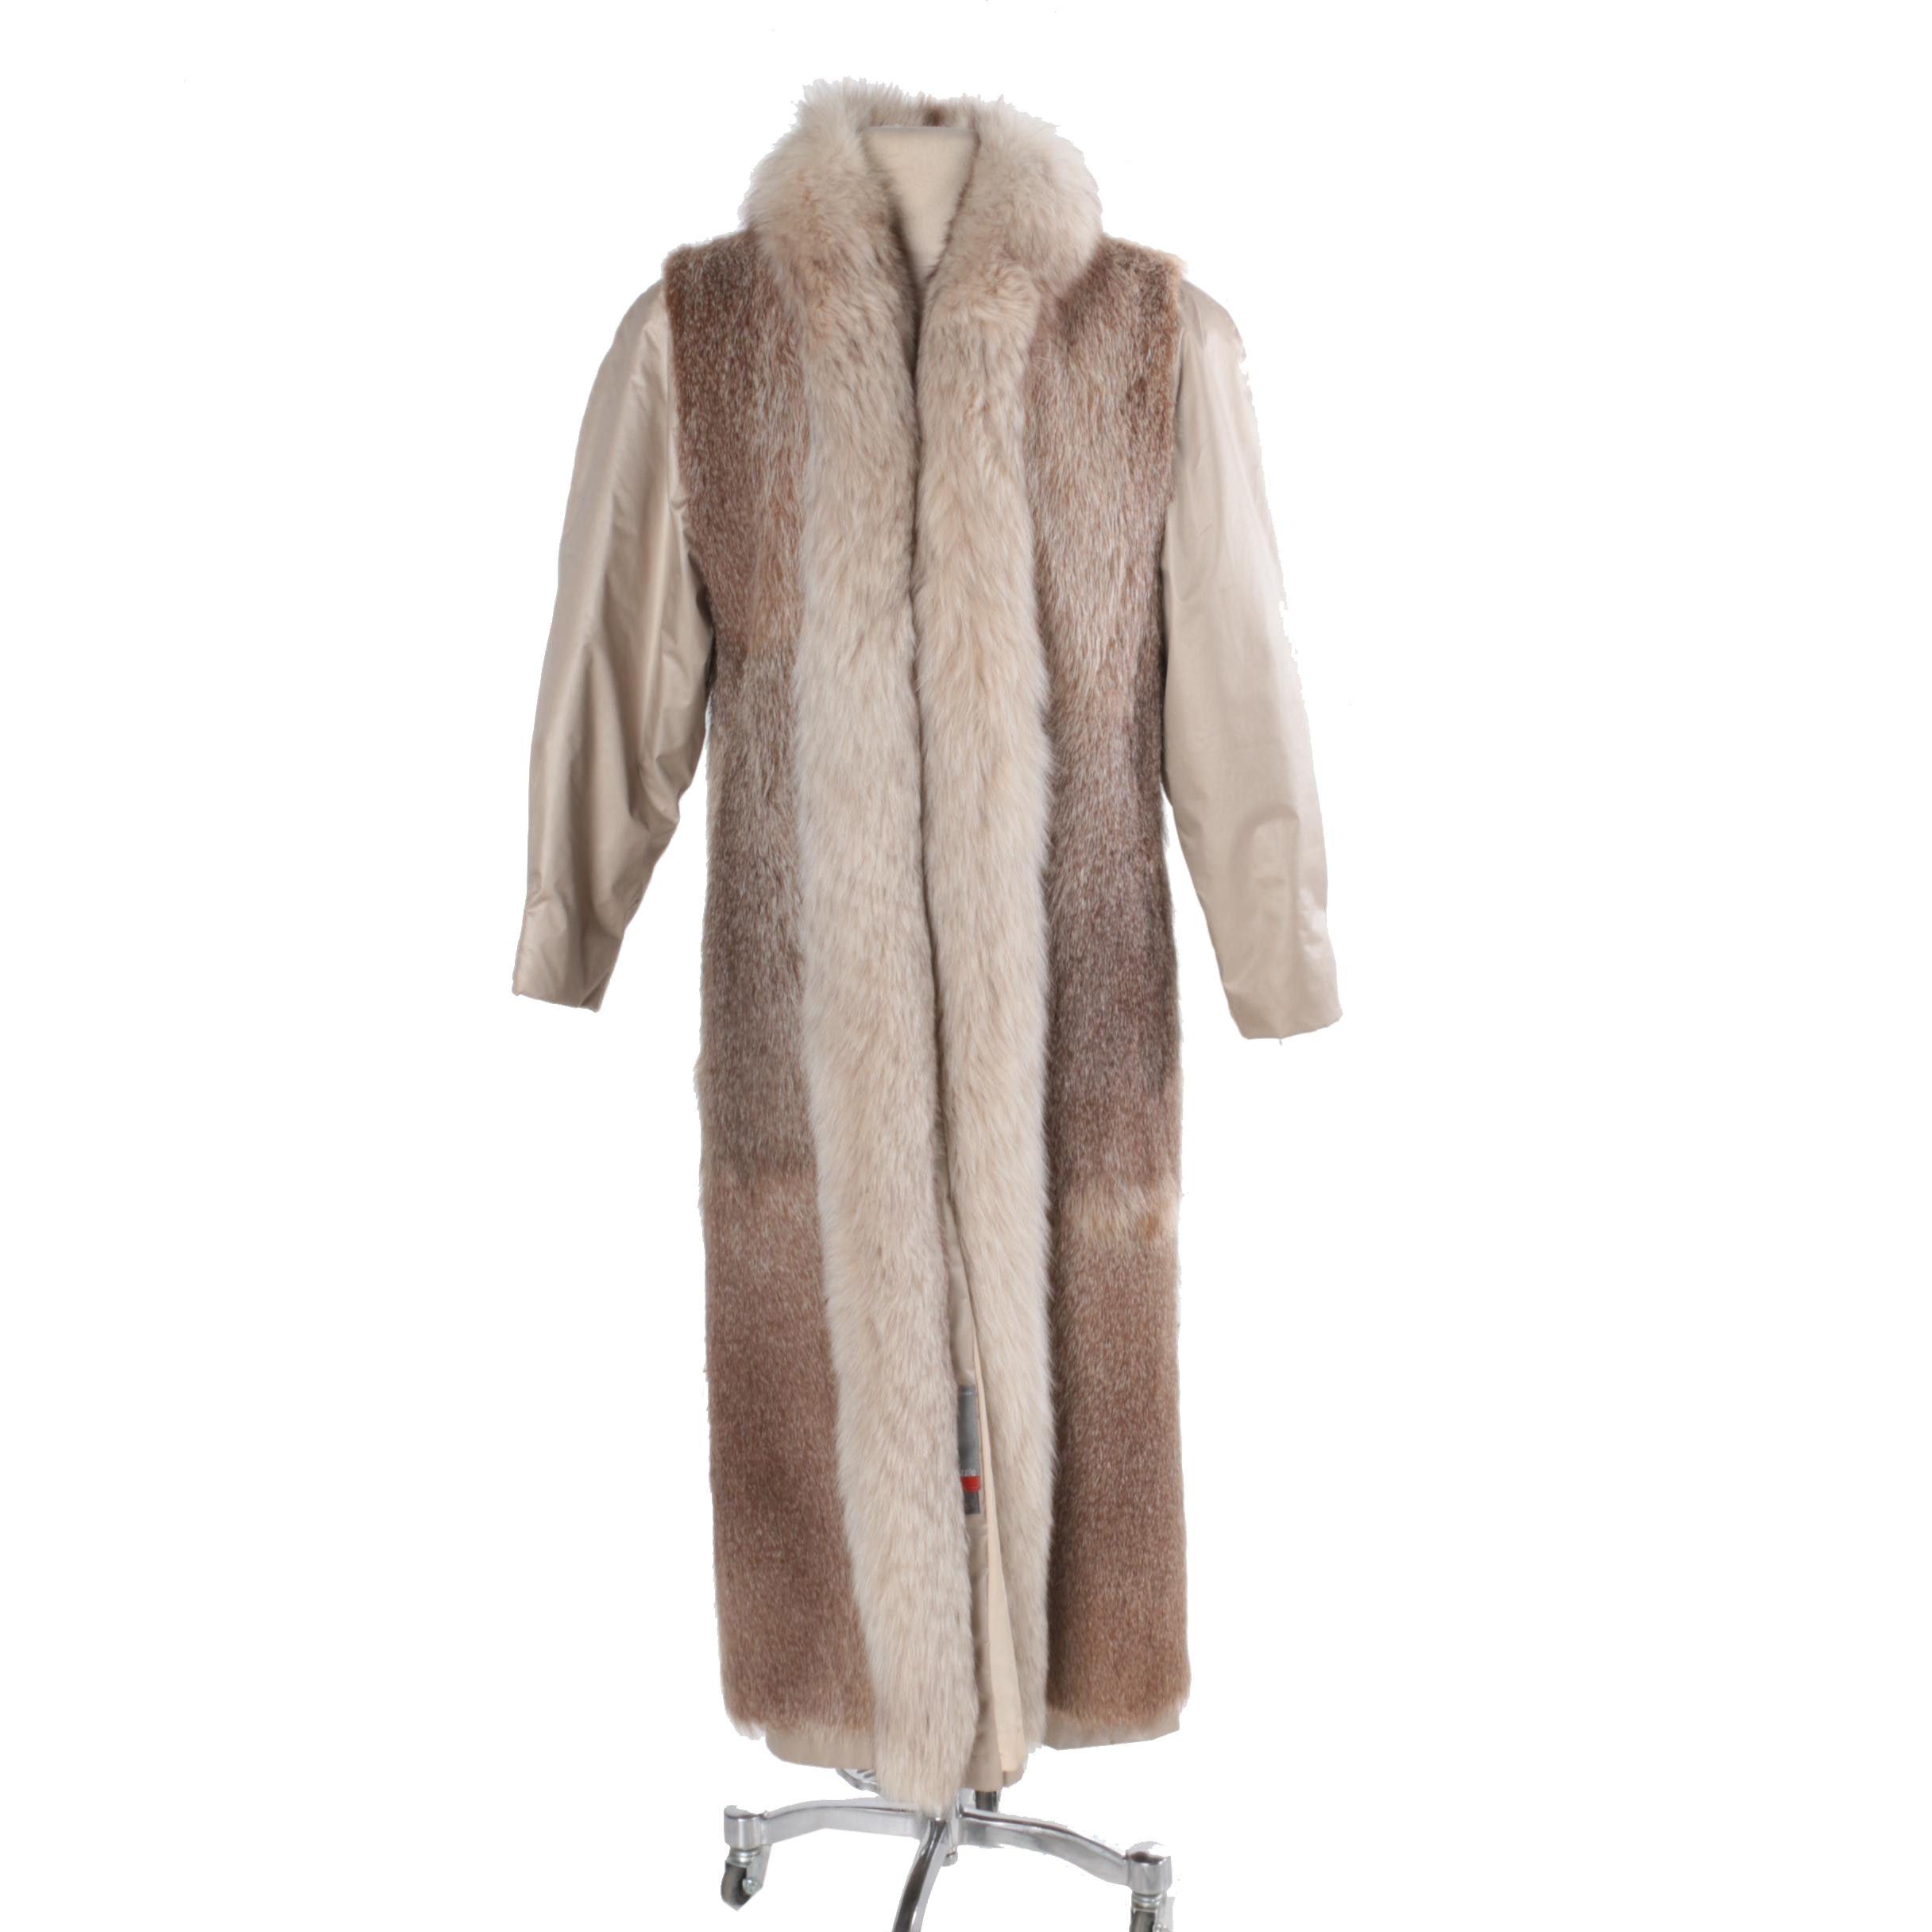 Women's Carol Cohen Drizzle Nutria and Fox Fur Coat Vest